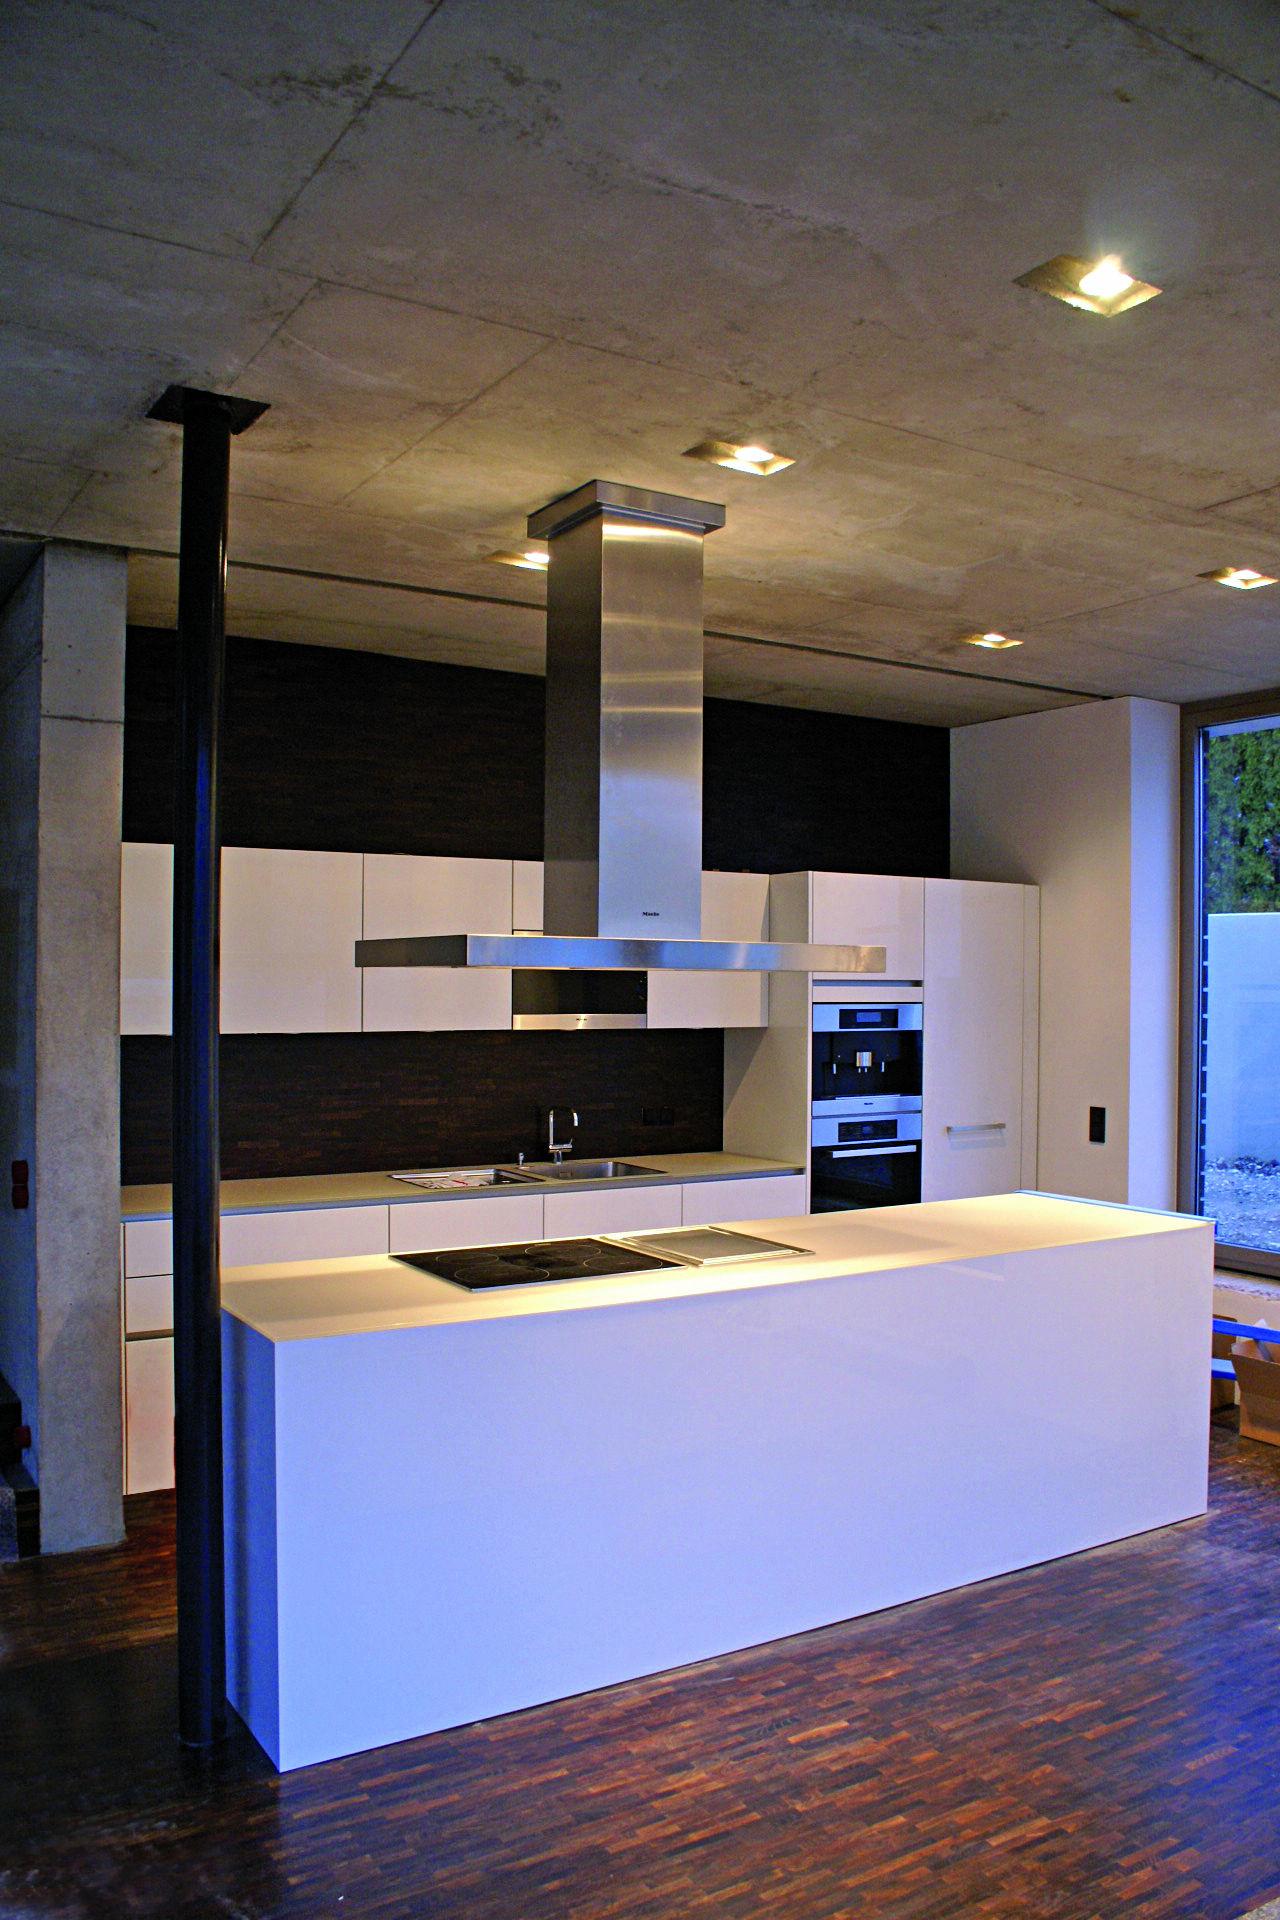 rohe architektur trifft moderne k che. Black Bedroom Furniture Sets. Home Design Ideas